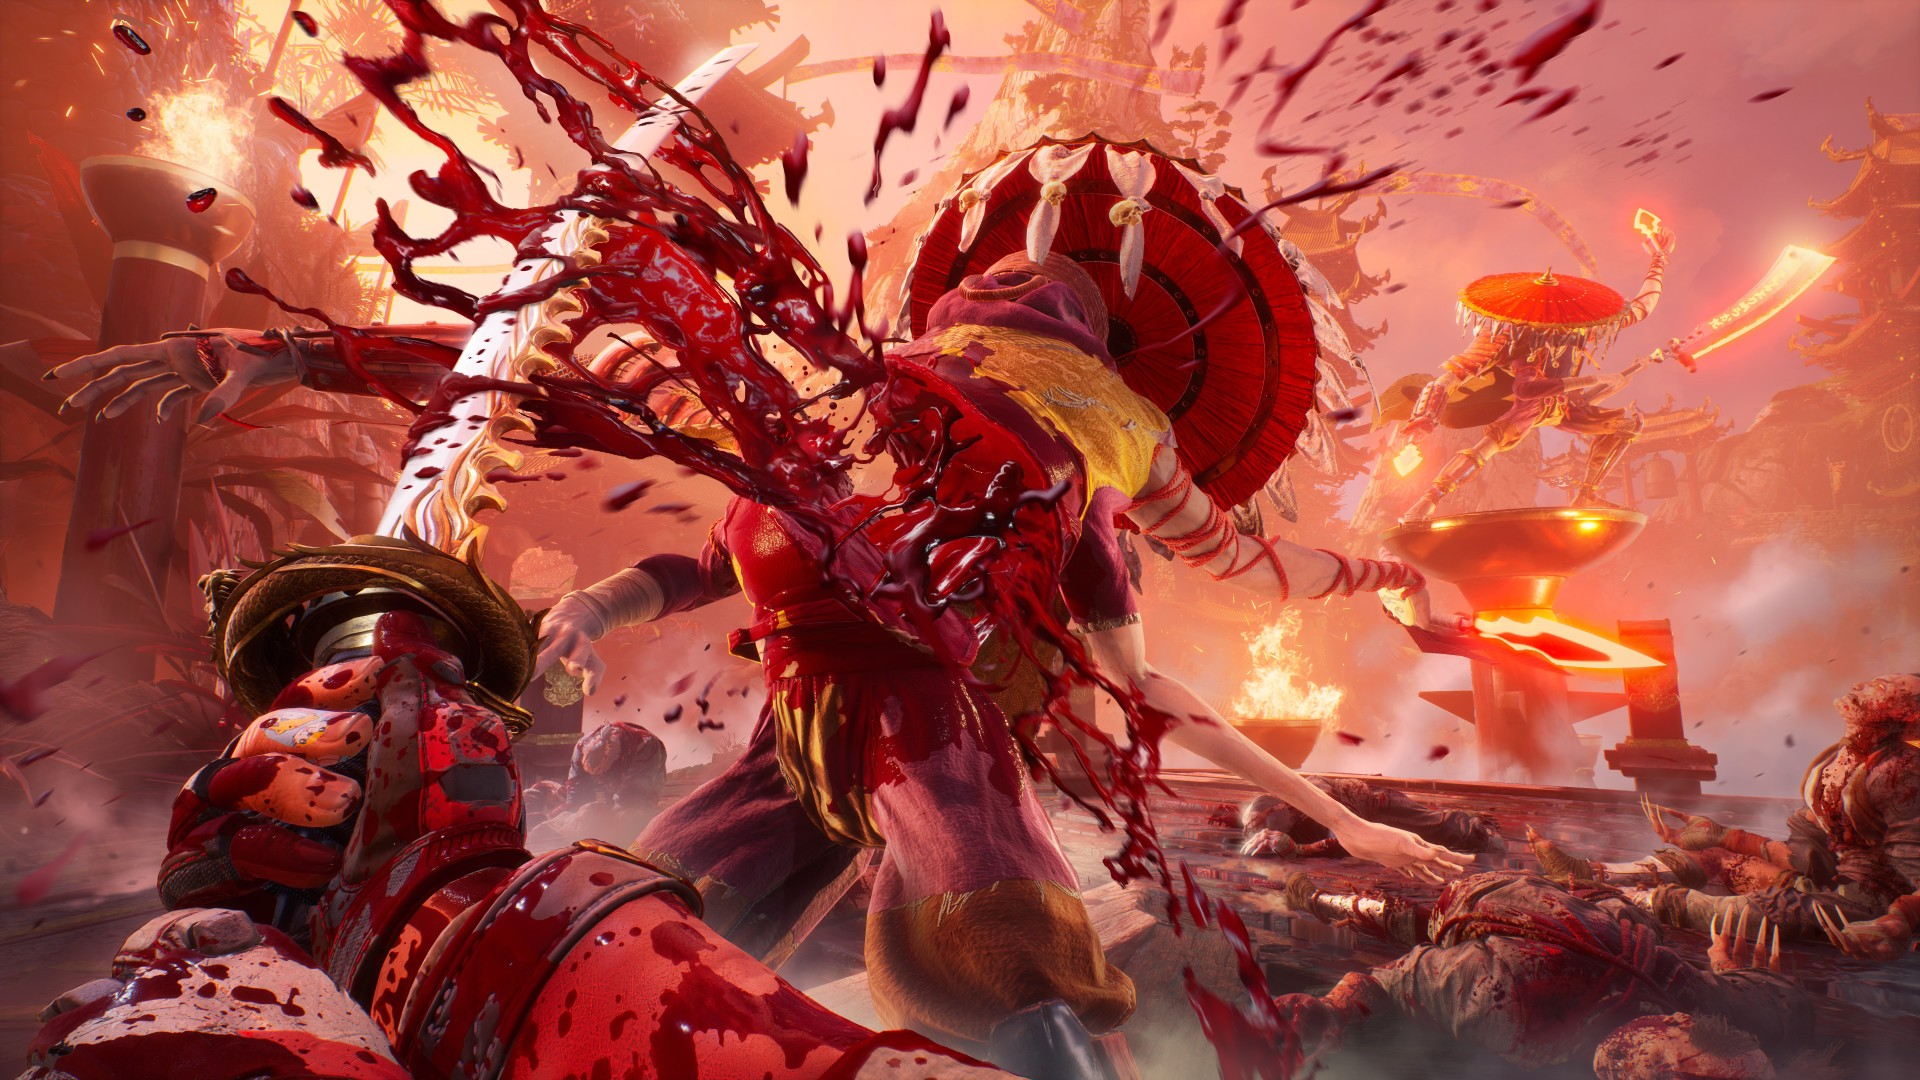 Shadow Warrior 3 fendente katana artwork